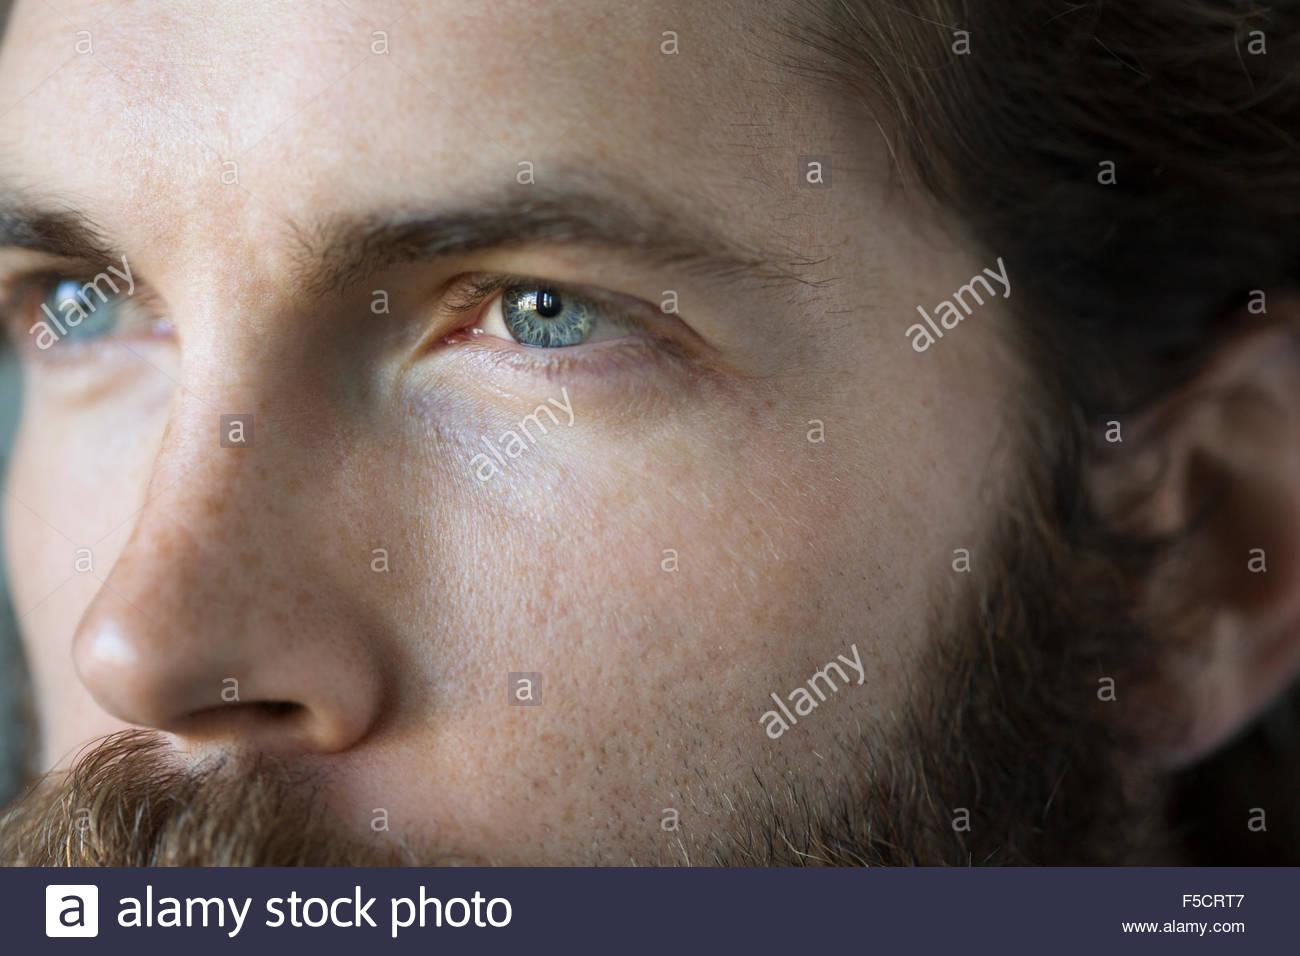 Full frame close of pensive man blue eyes - Stock Image